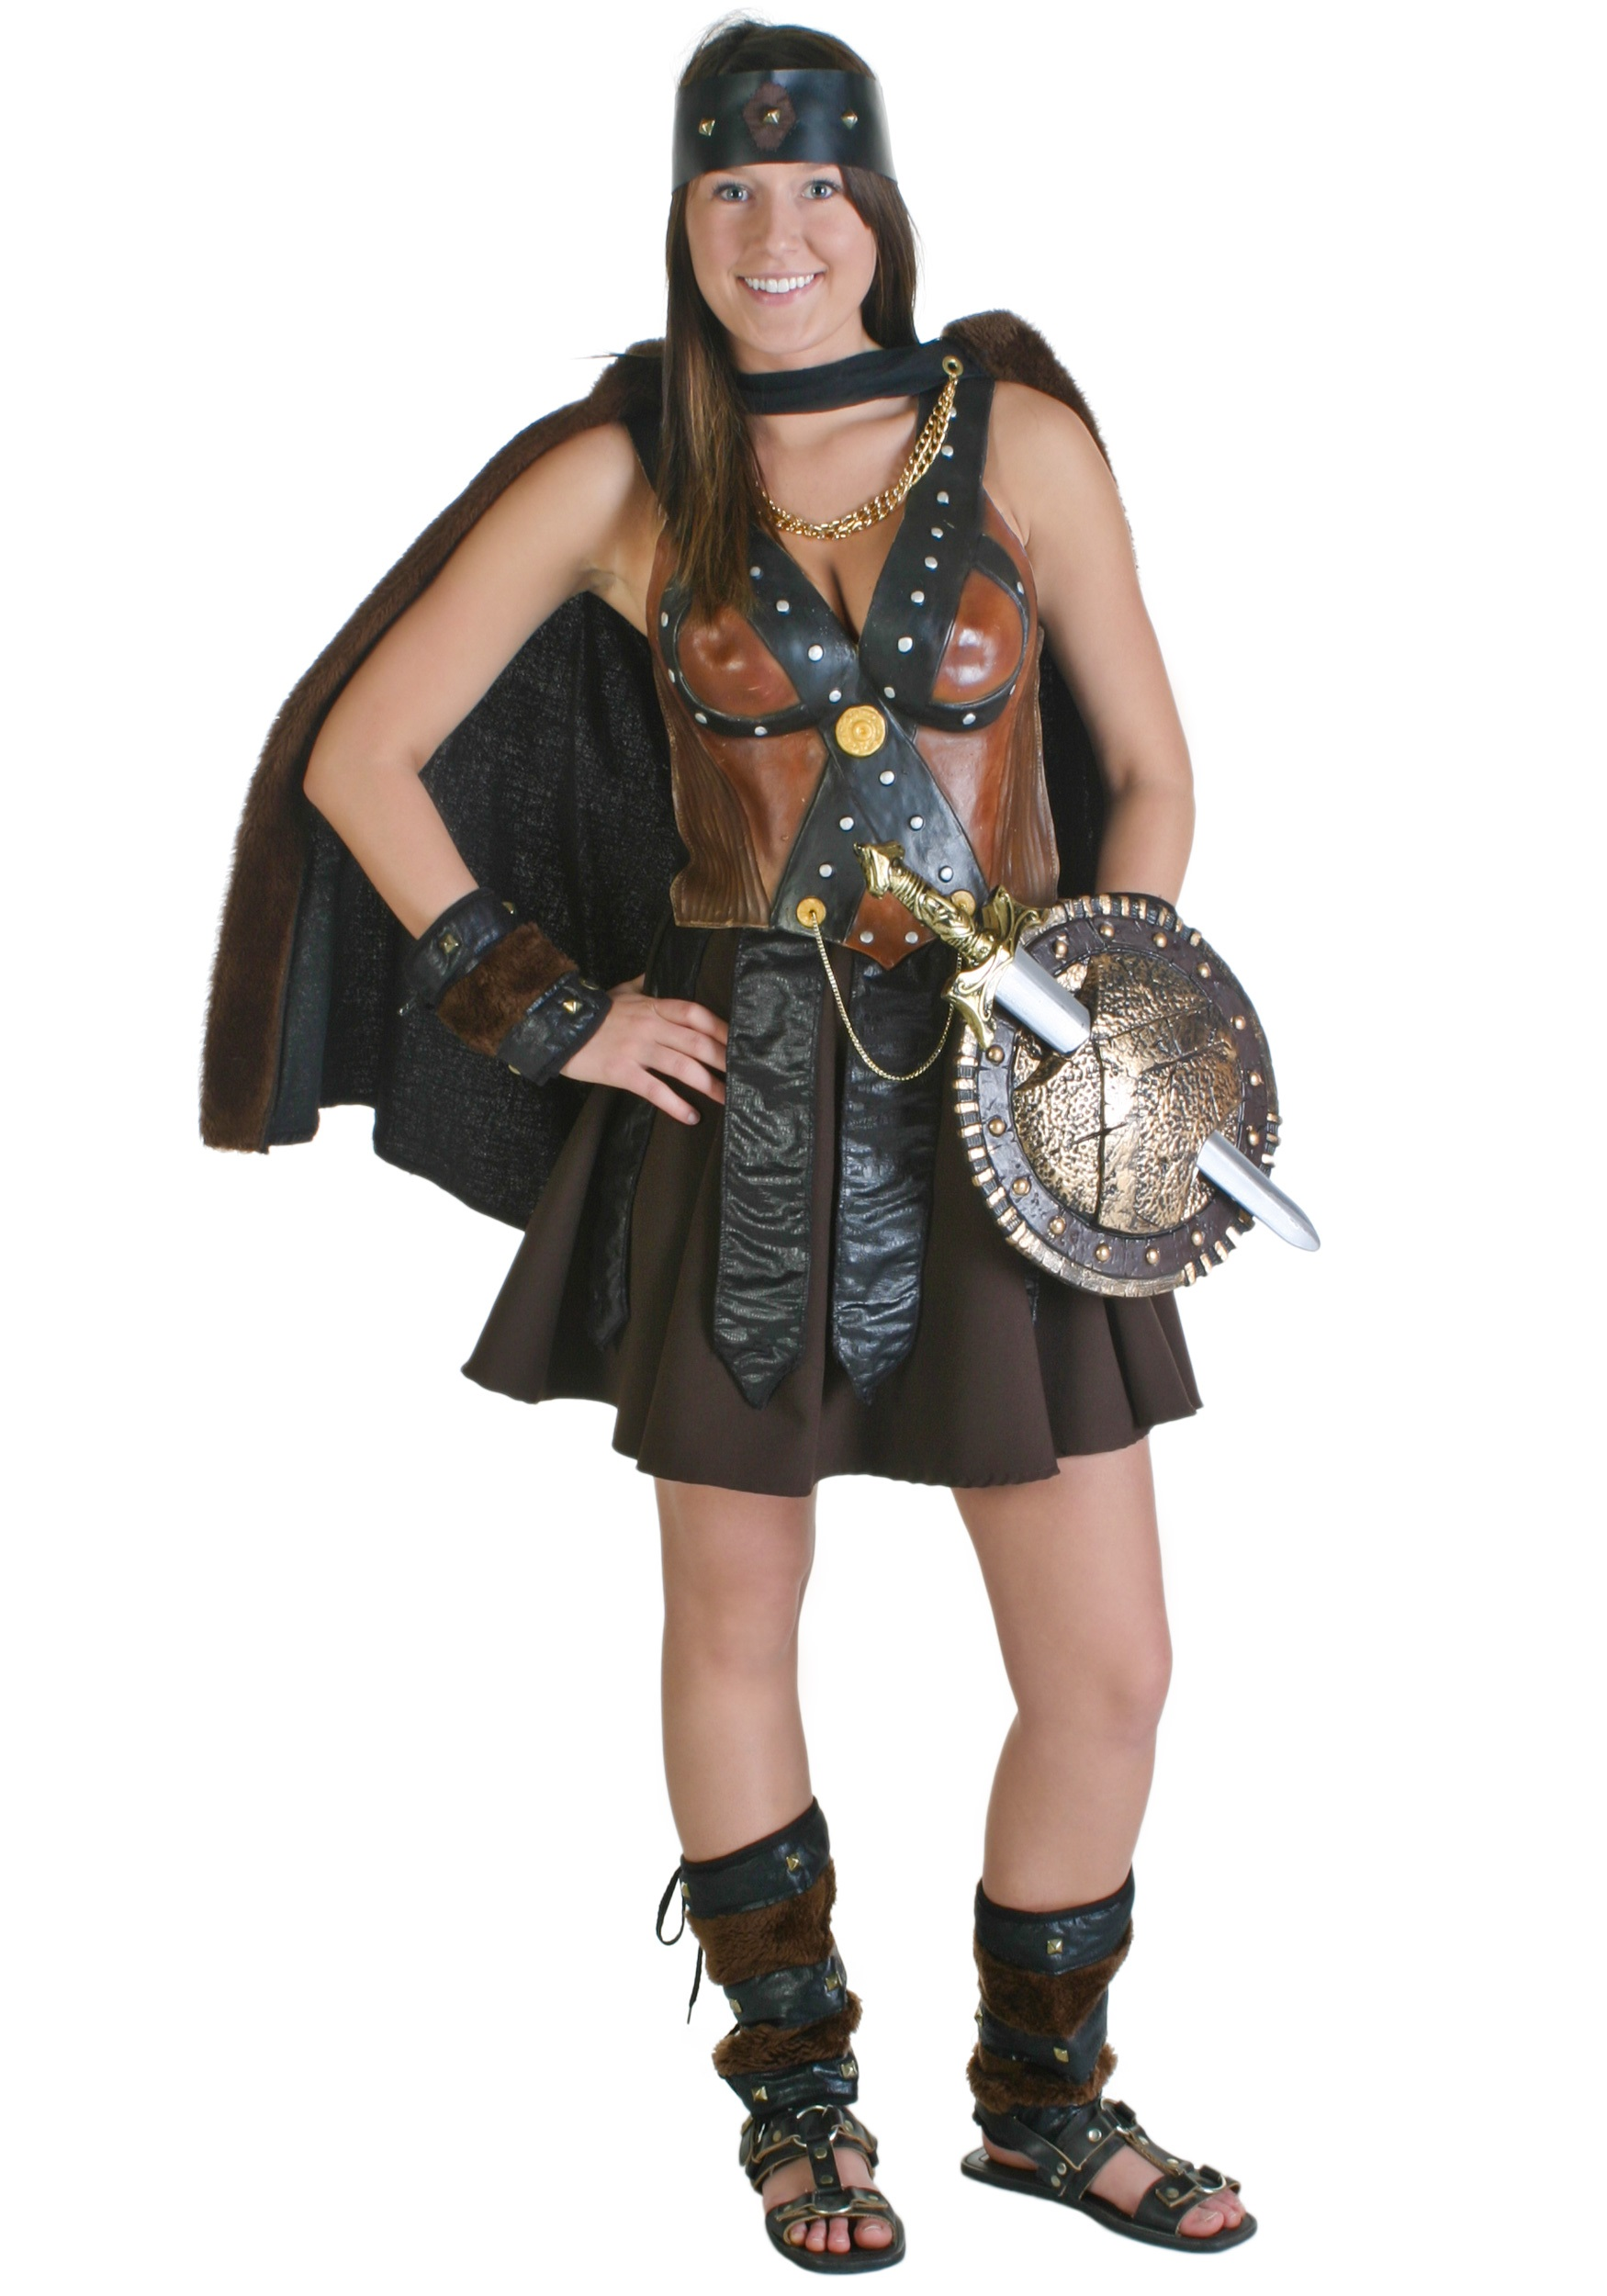 Xena Warrior Princess Costume Xena Costume Plus Size...